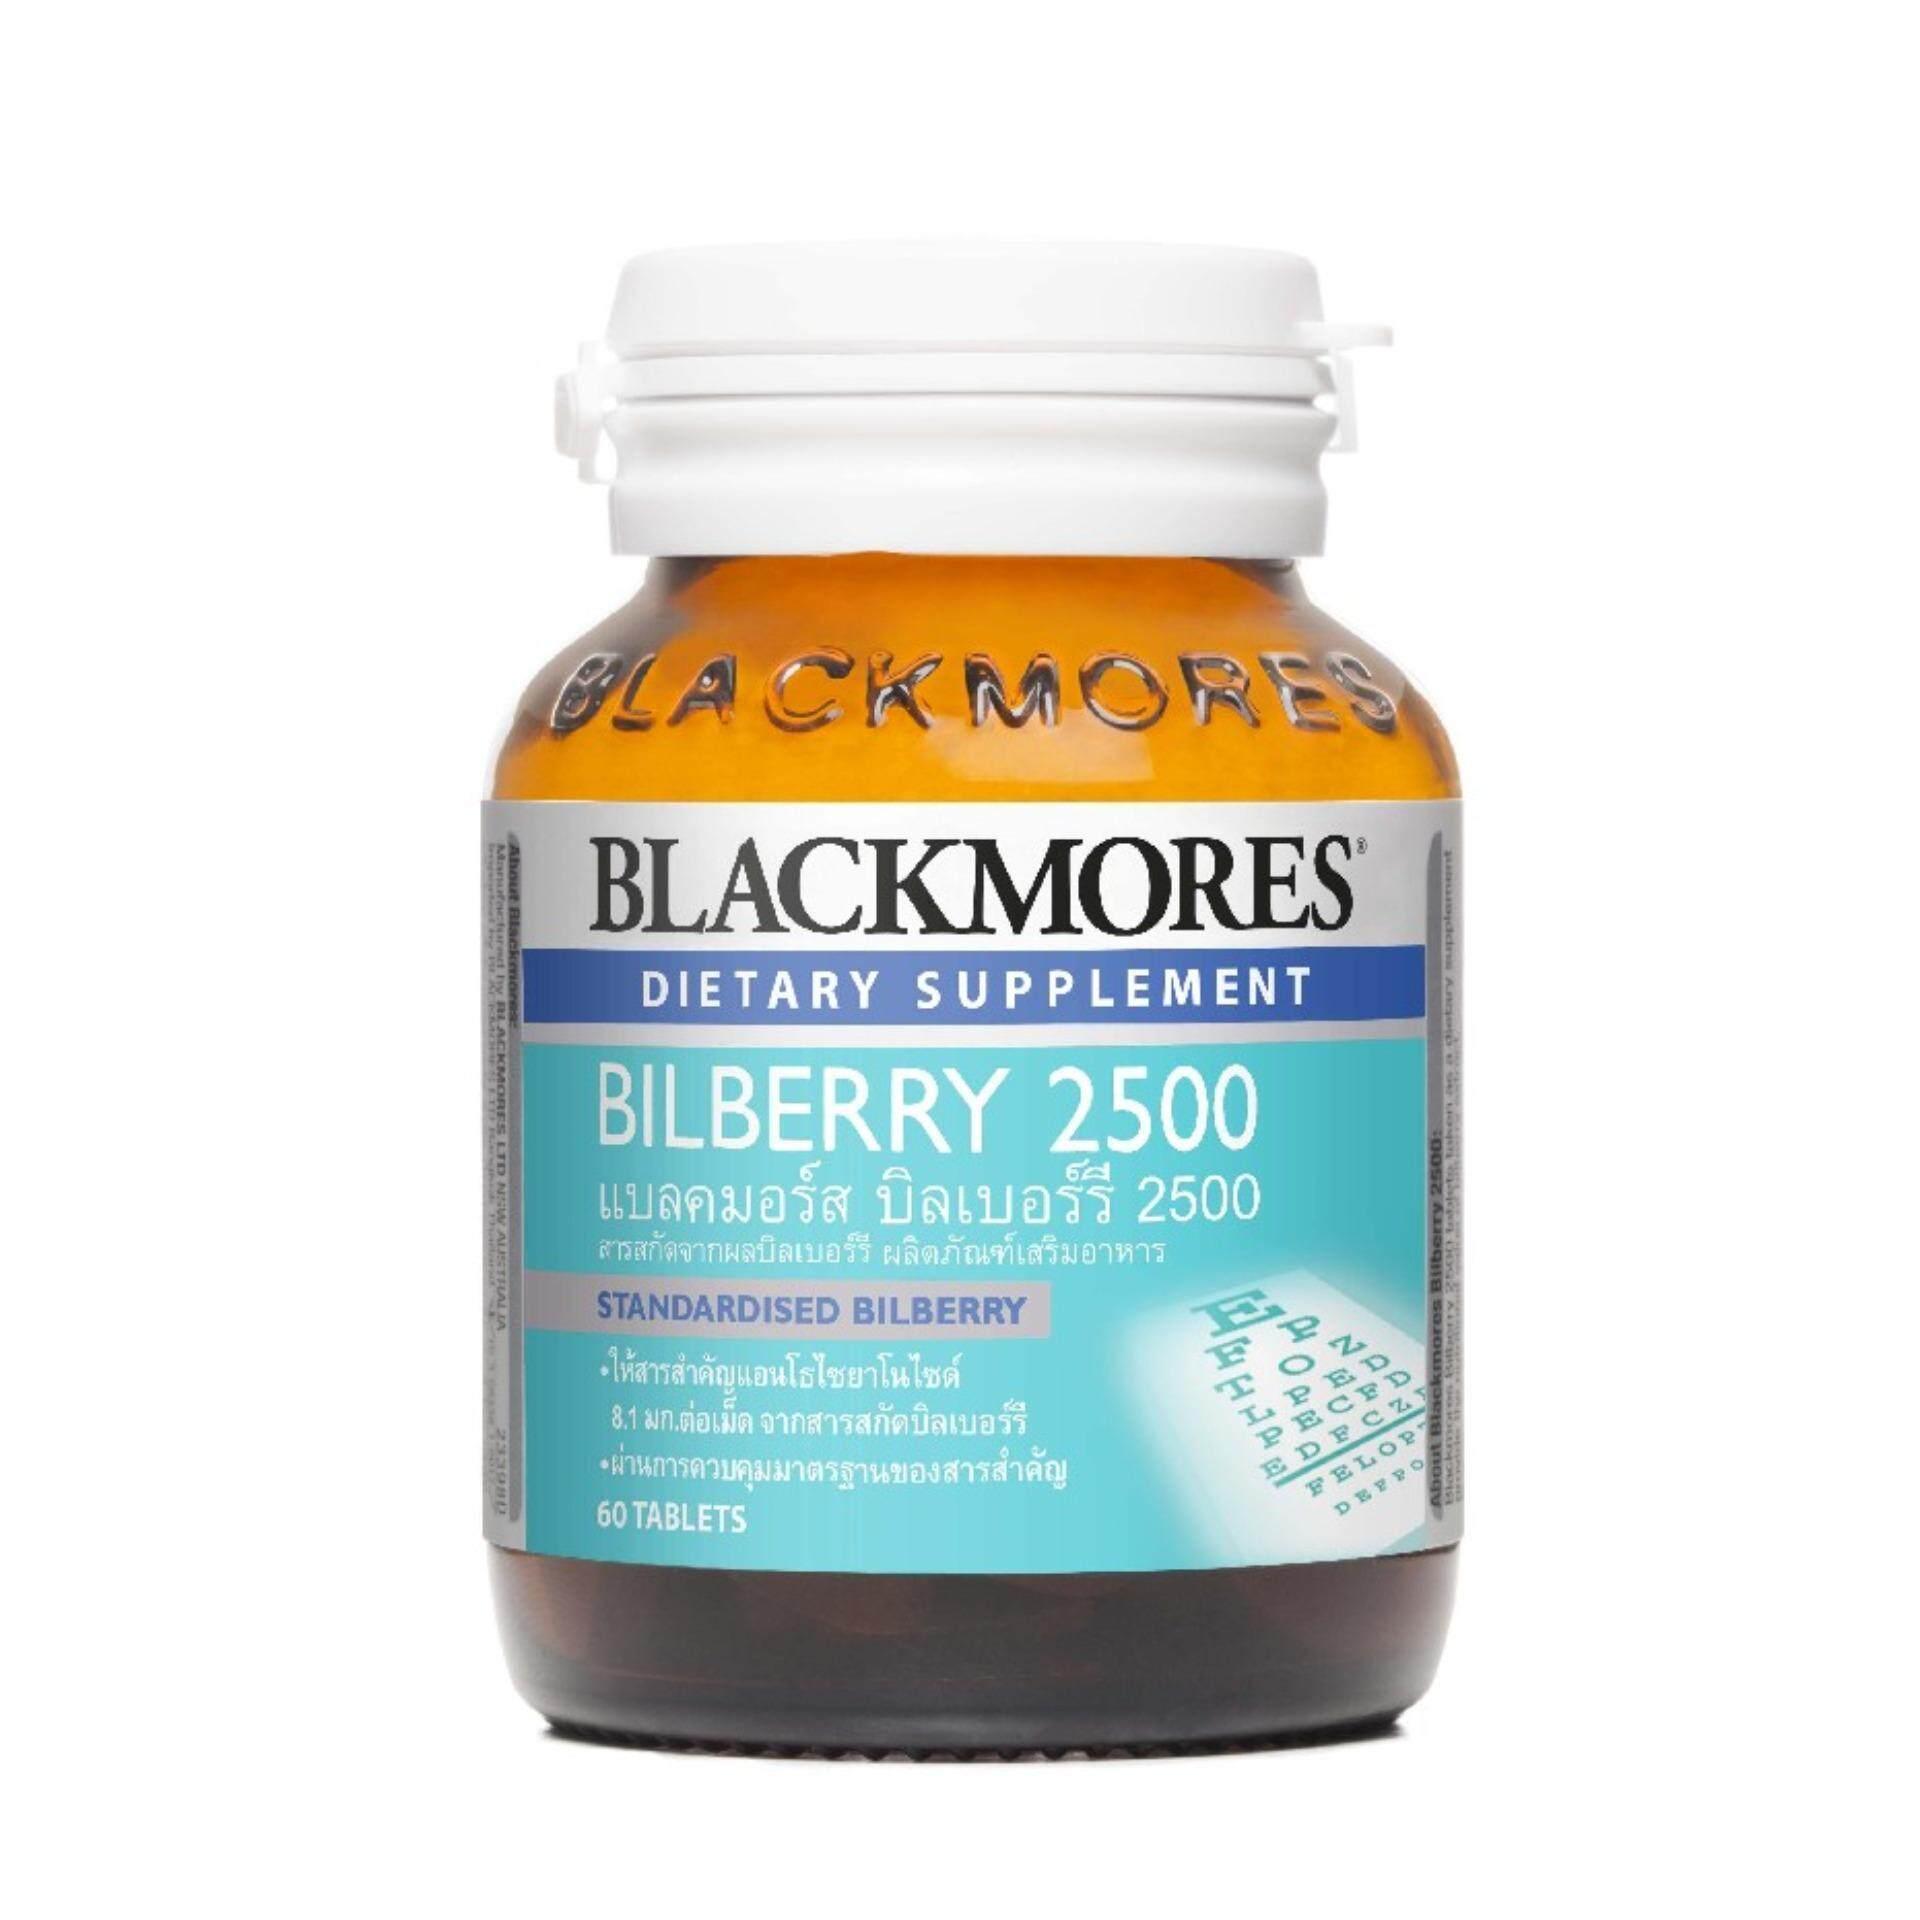 Blackmores ผลิตภัณฑ์เสริมอาหาร Bilberry 2500 60เม็ด เป็นต้นฉบับ